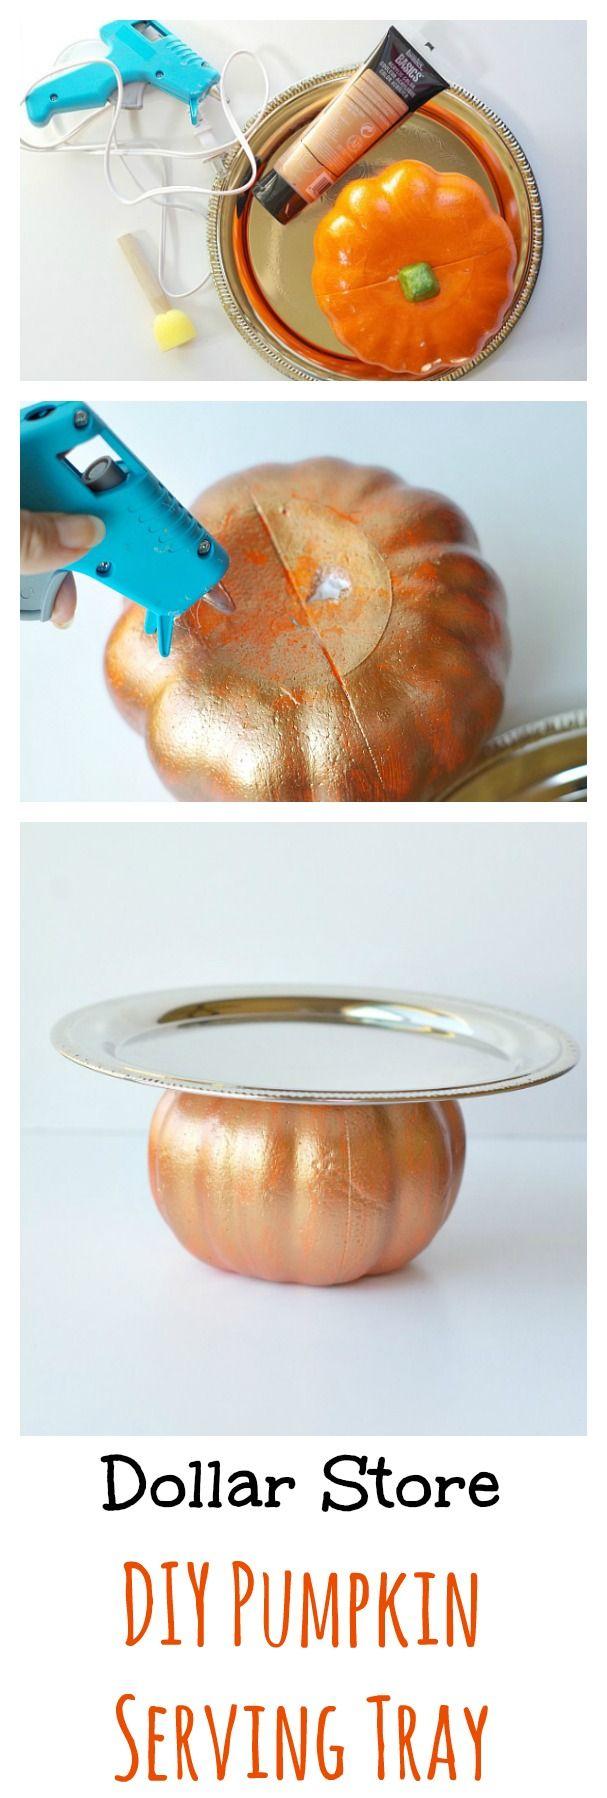 Dollar Store DIY Pumpkin Serving Tray